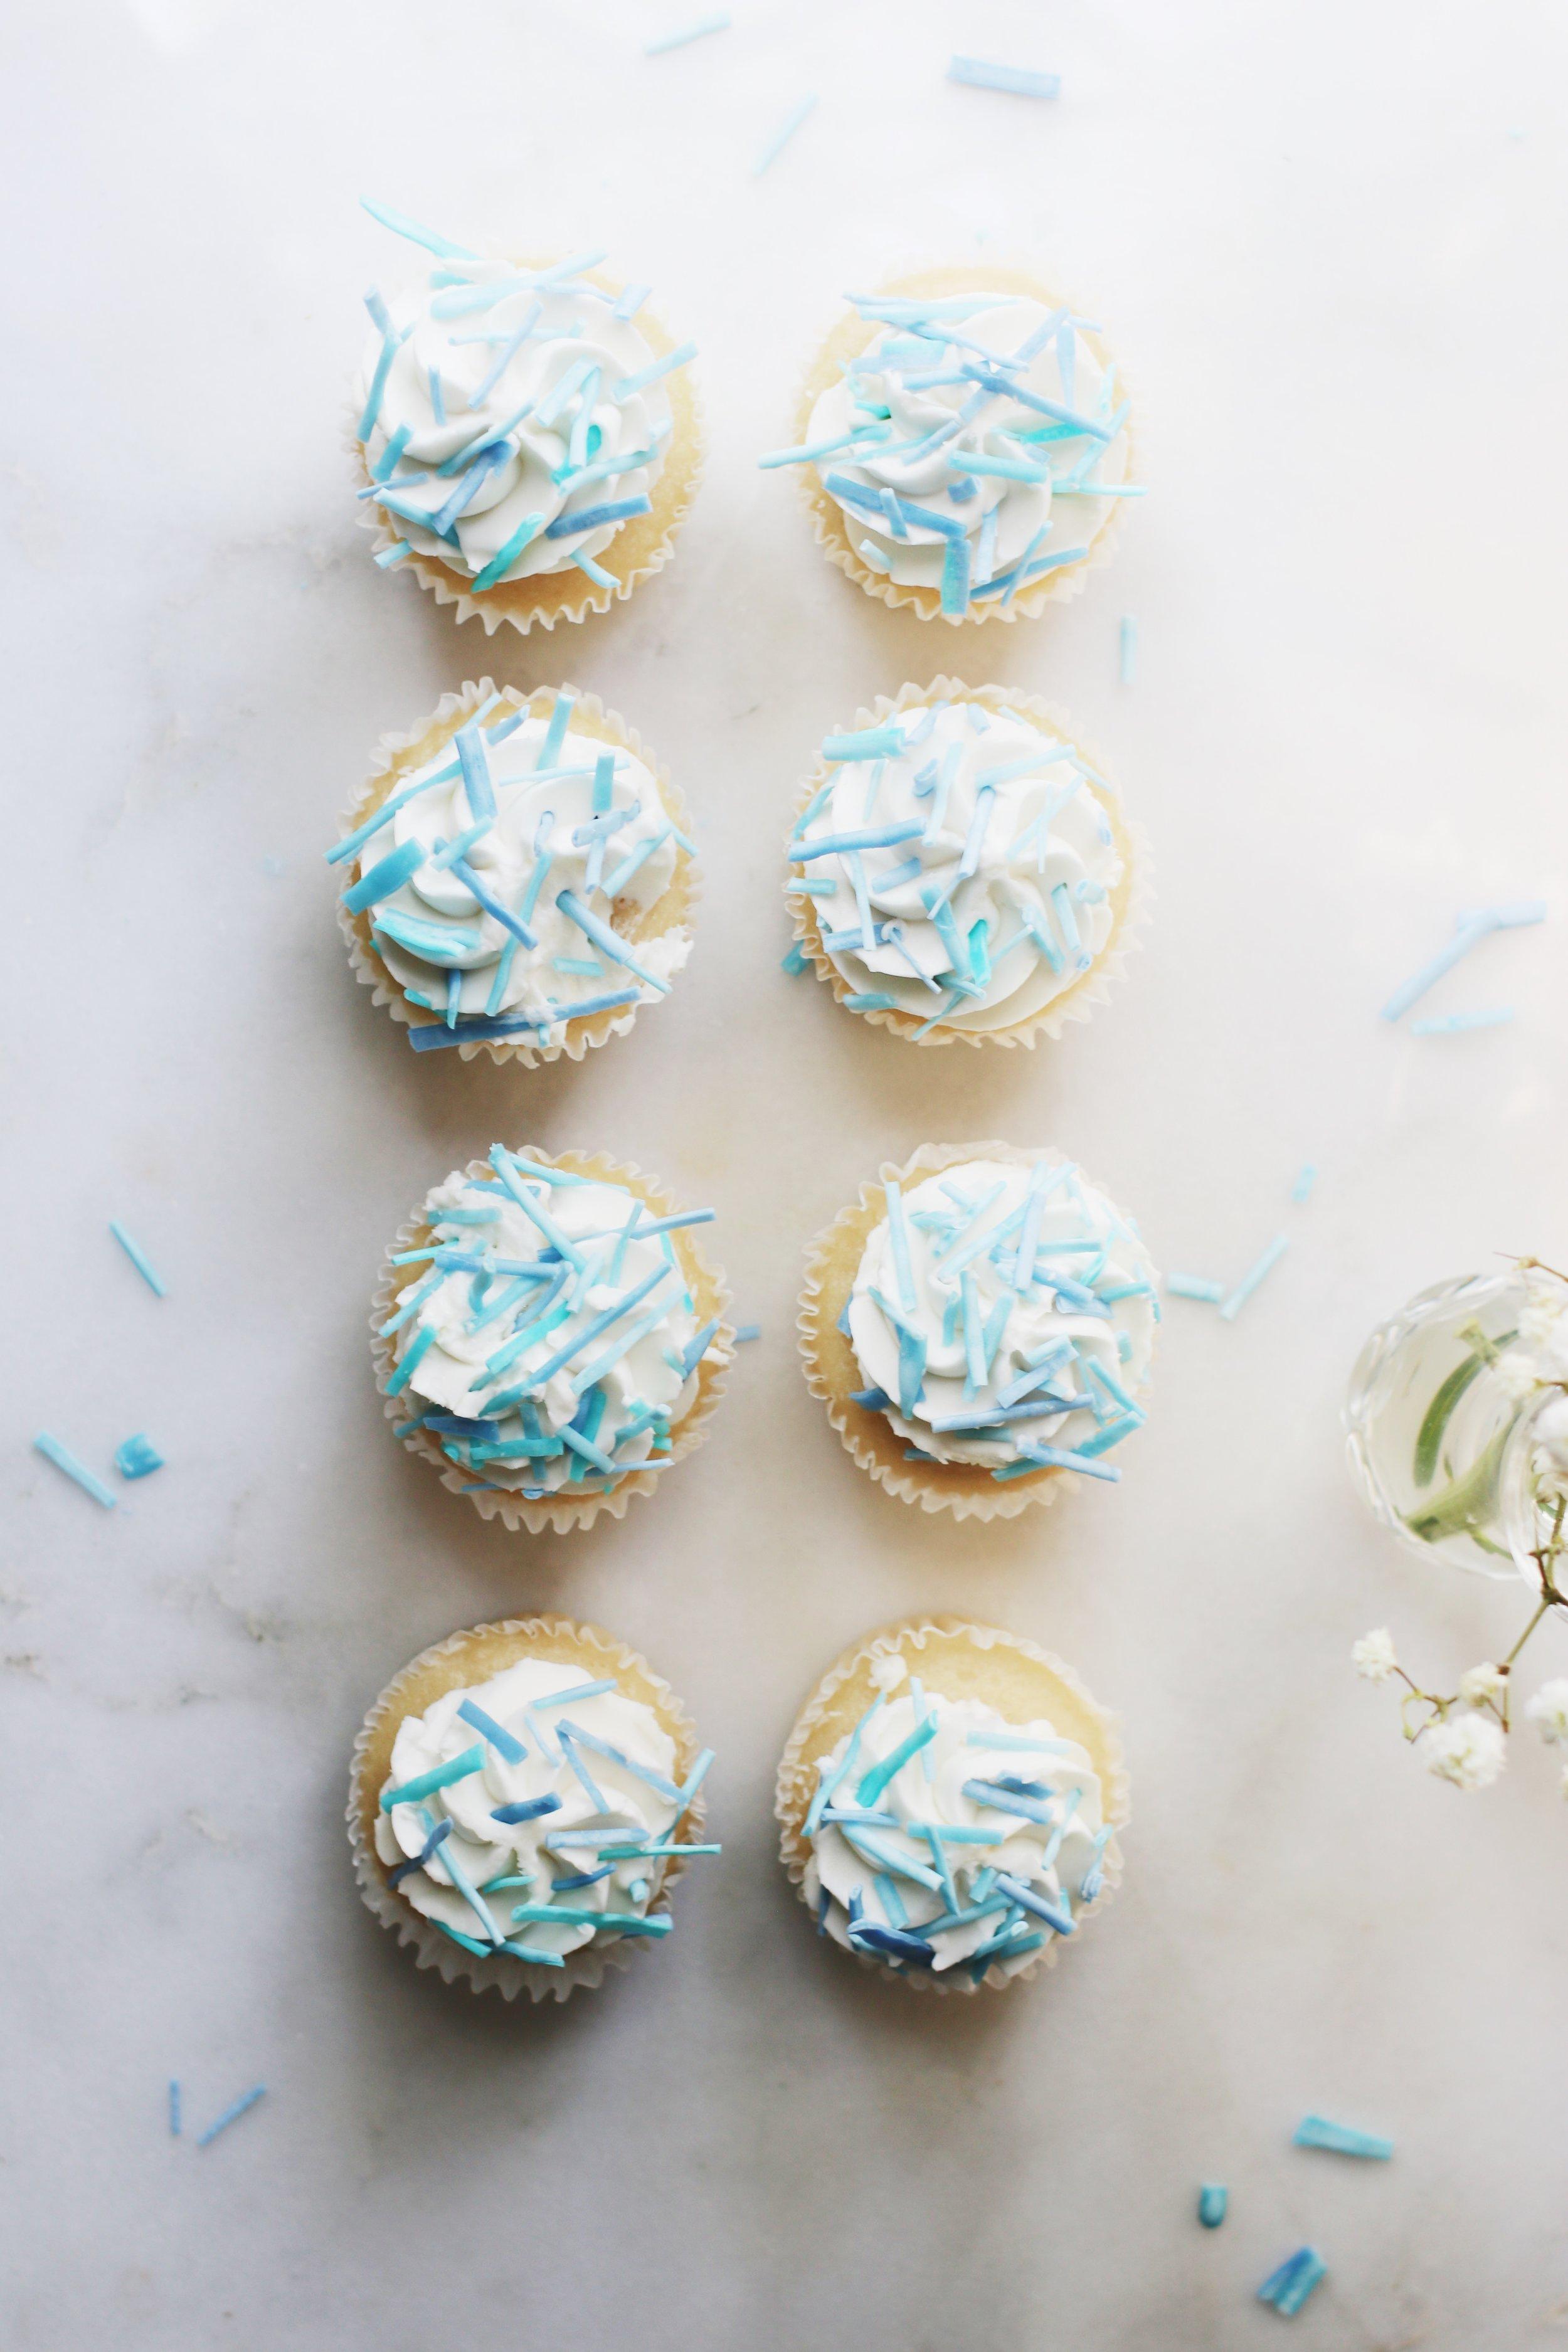 hanukkah-cupcakes-homemade-sprinkles-recipe-27.JPG